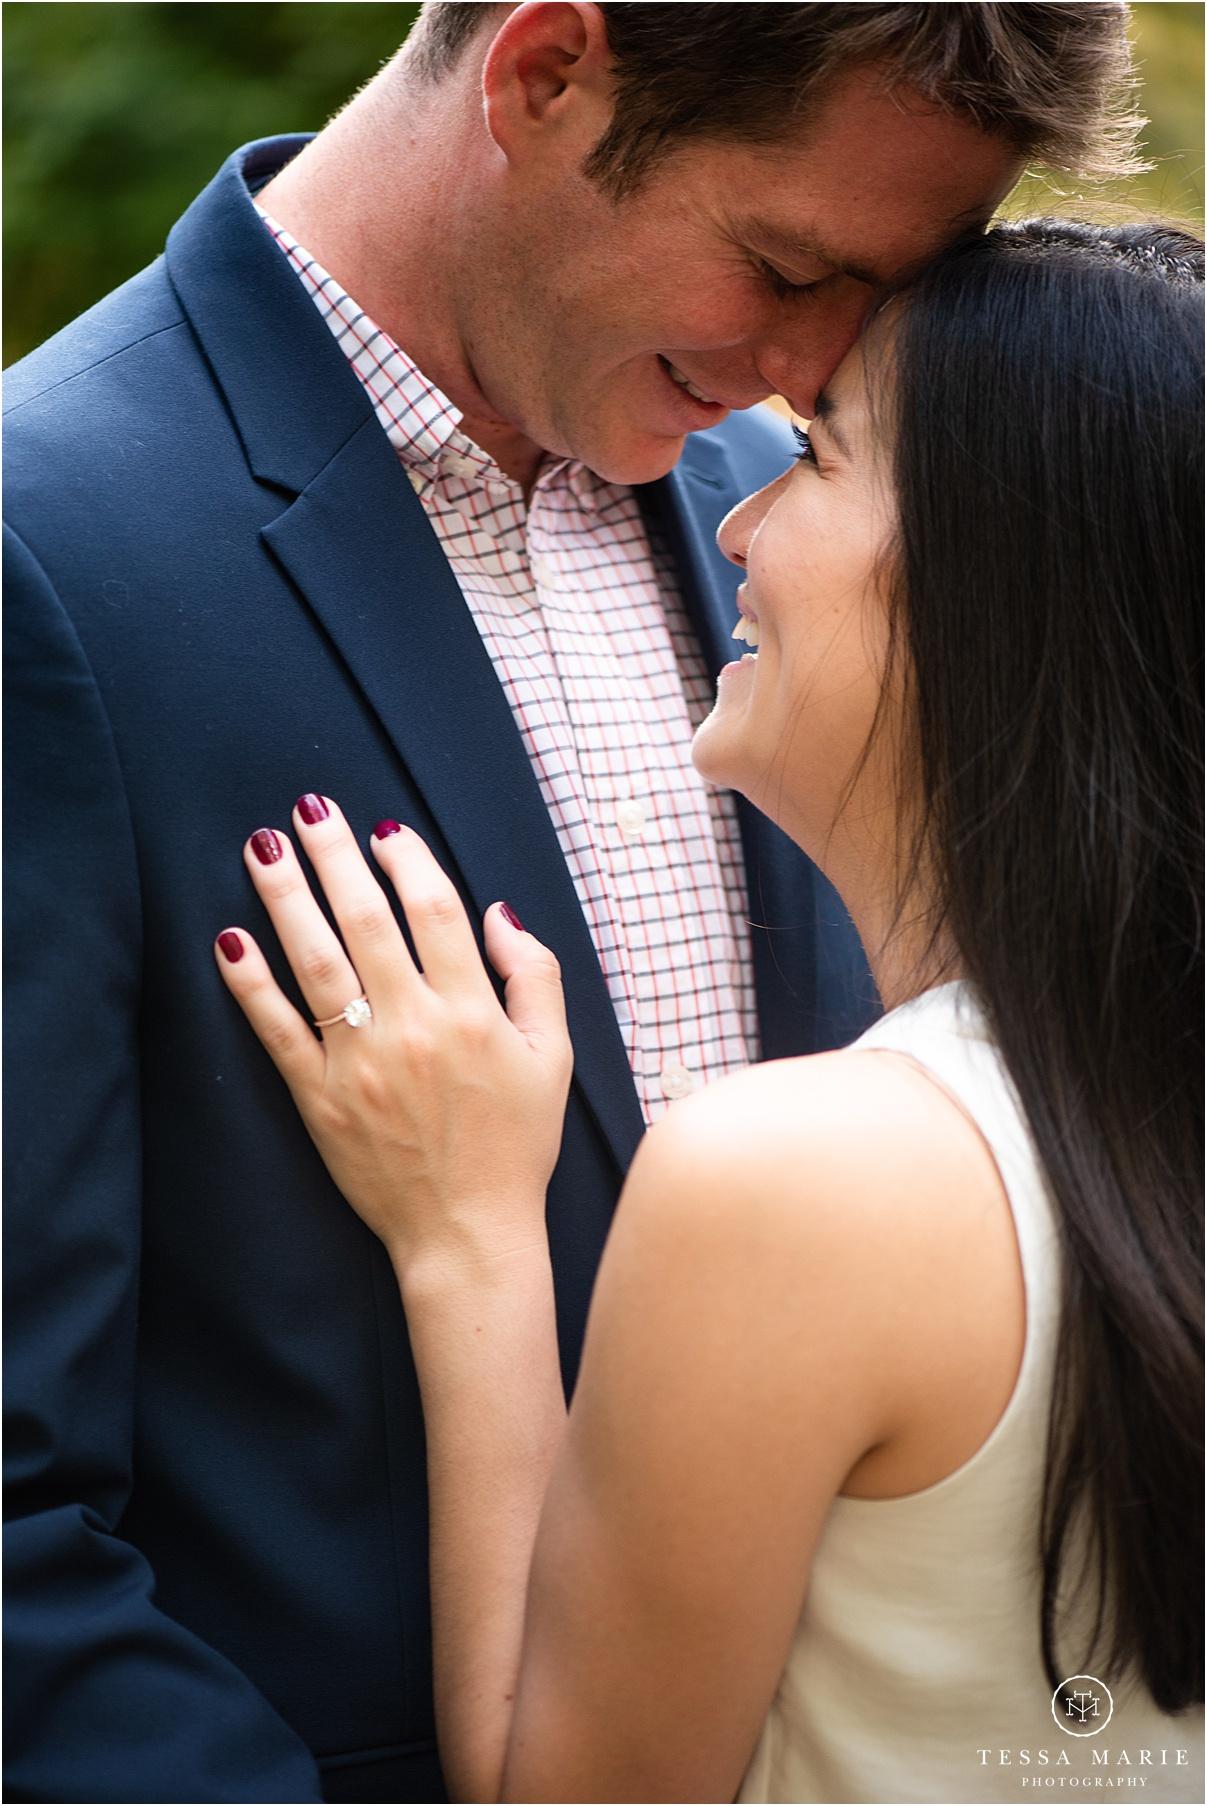 Tessa_marie_photography_wedding_photographer_engagement_pictures_piedmont_park_0052.jpg